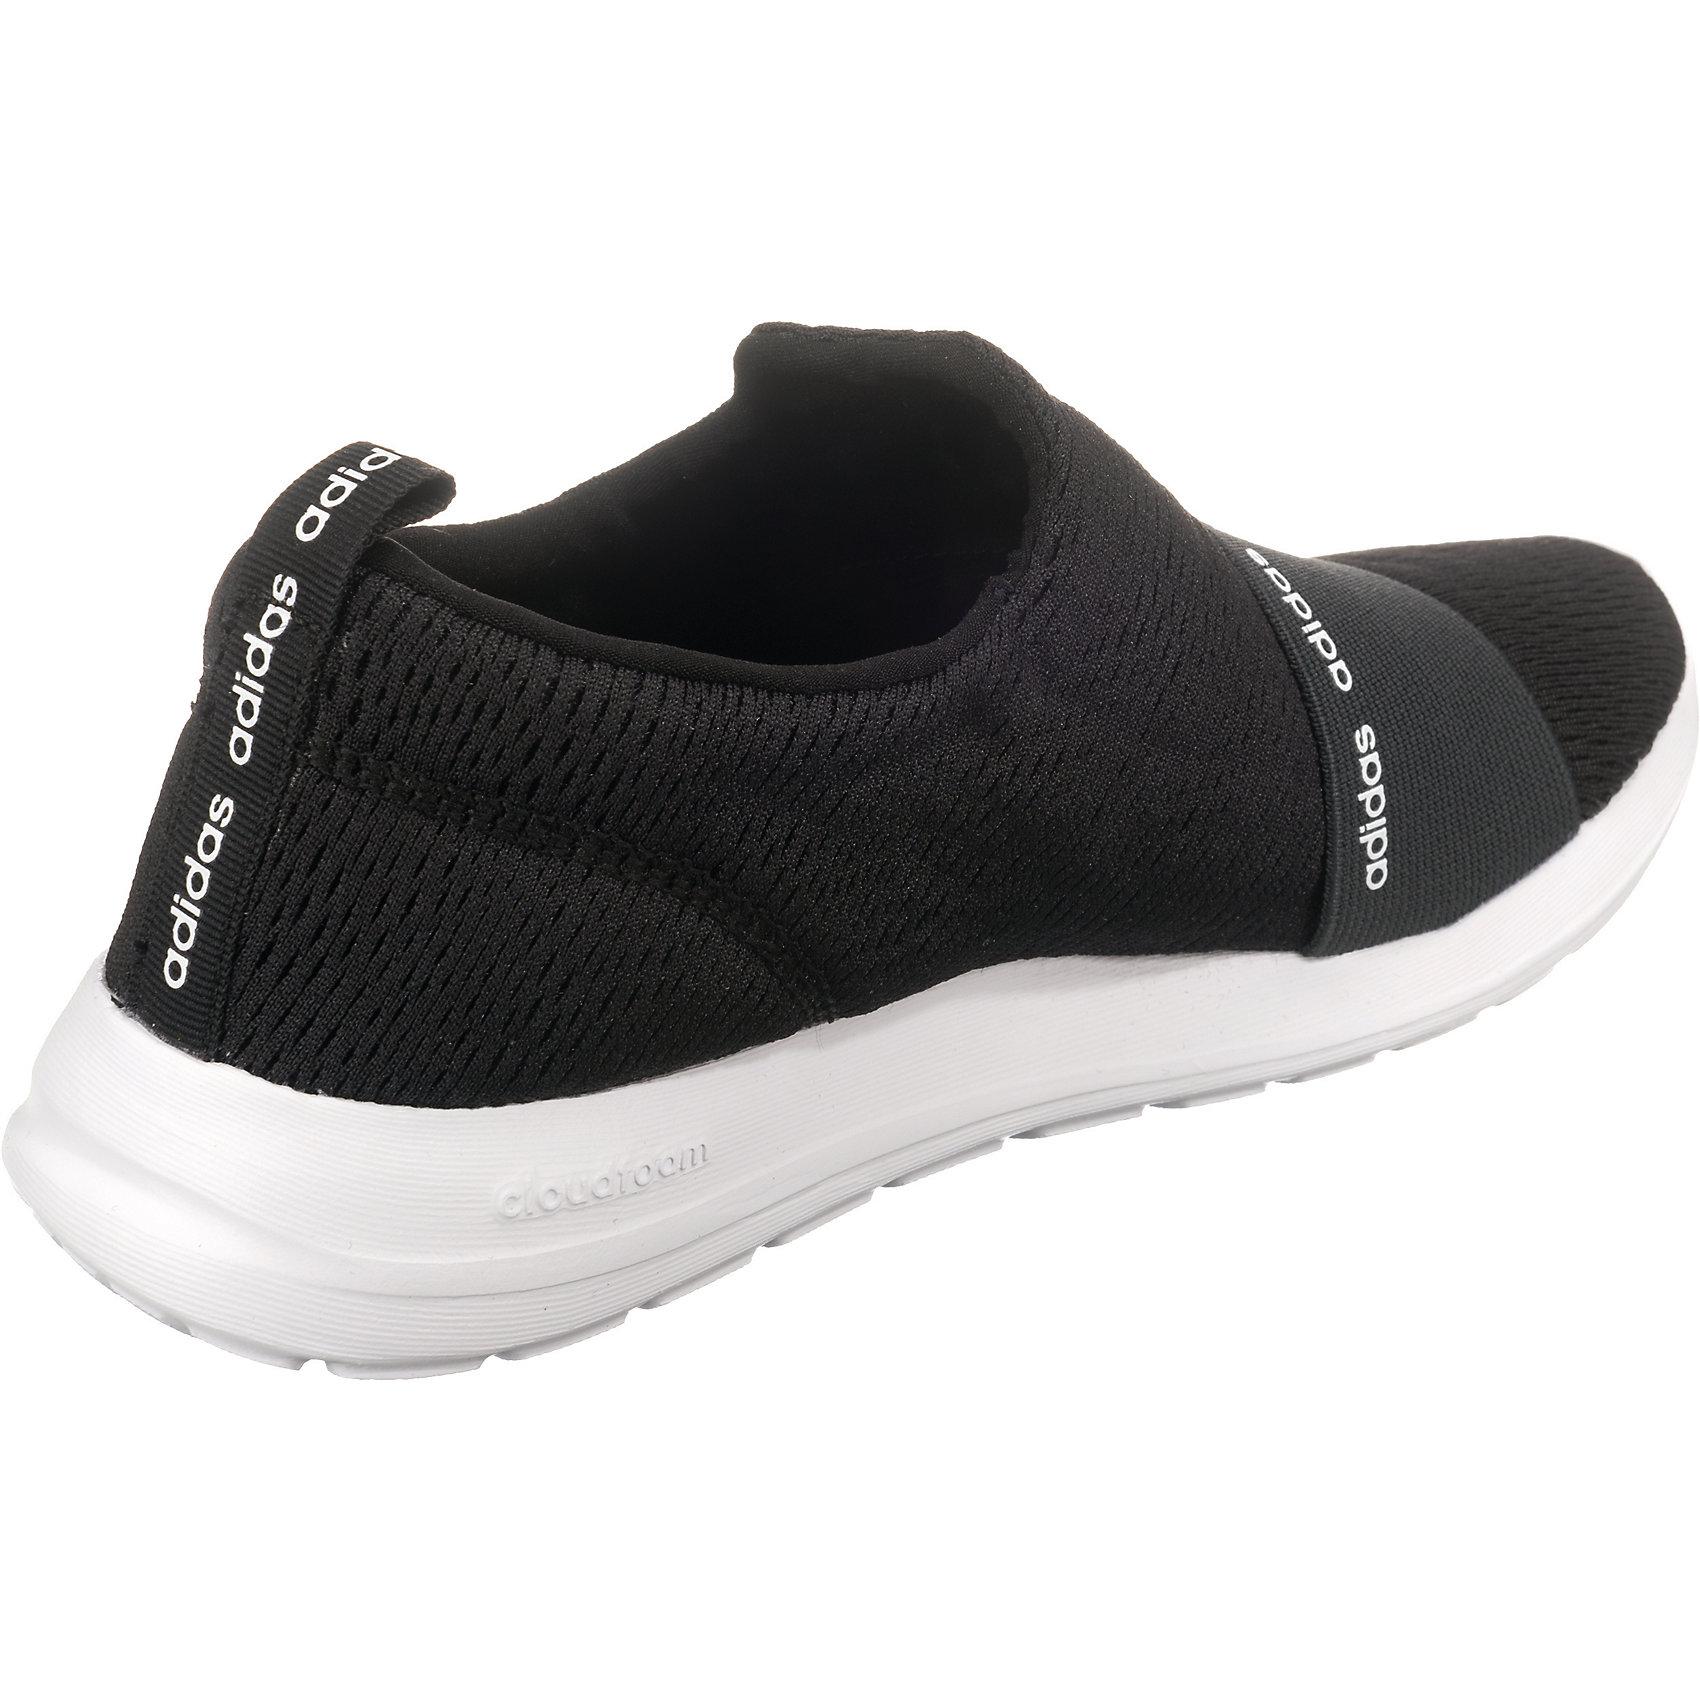 7501690 Inspired Adapt Damen Refine Sport Neu Für Sneakers Adidas iXOPTkuZ